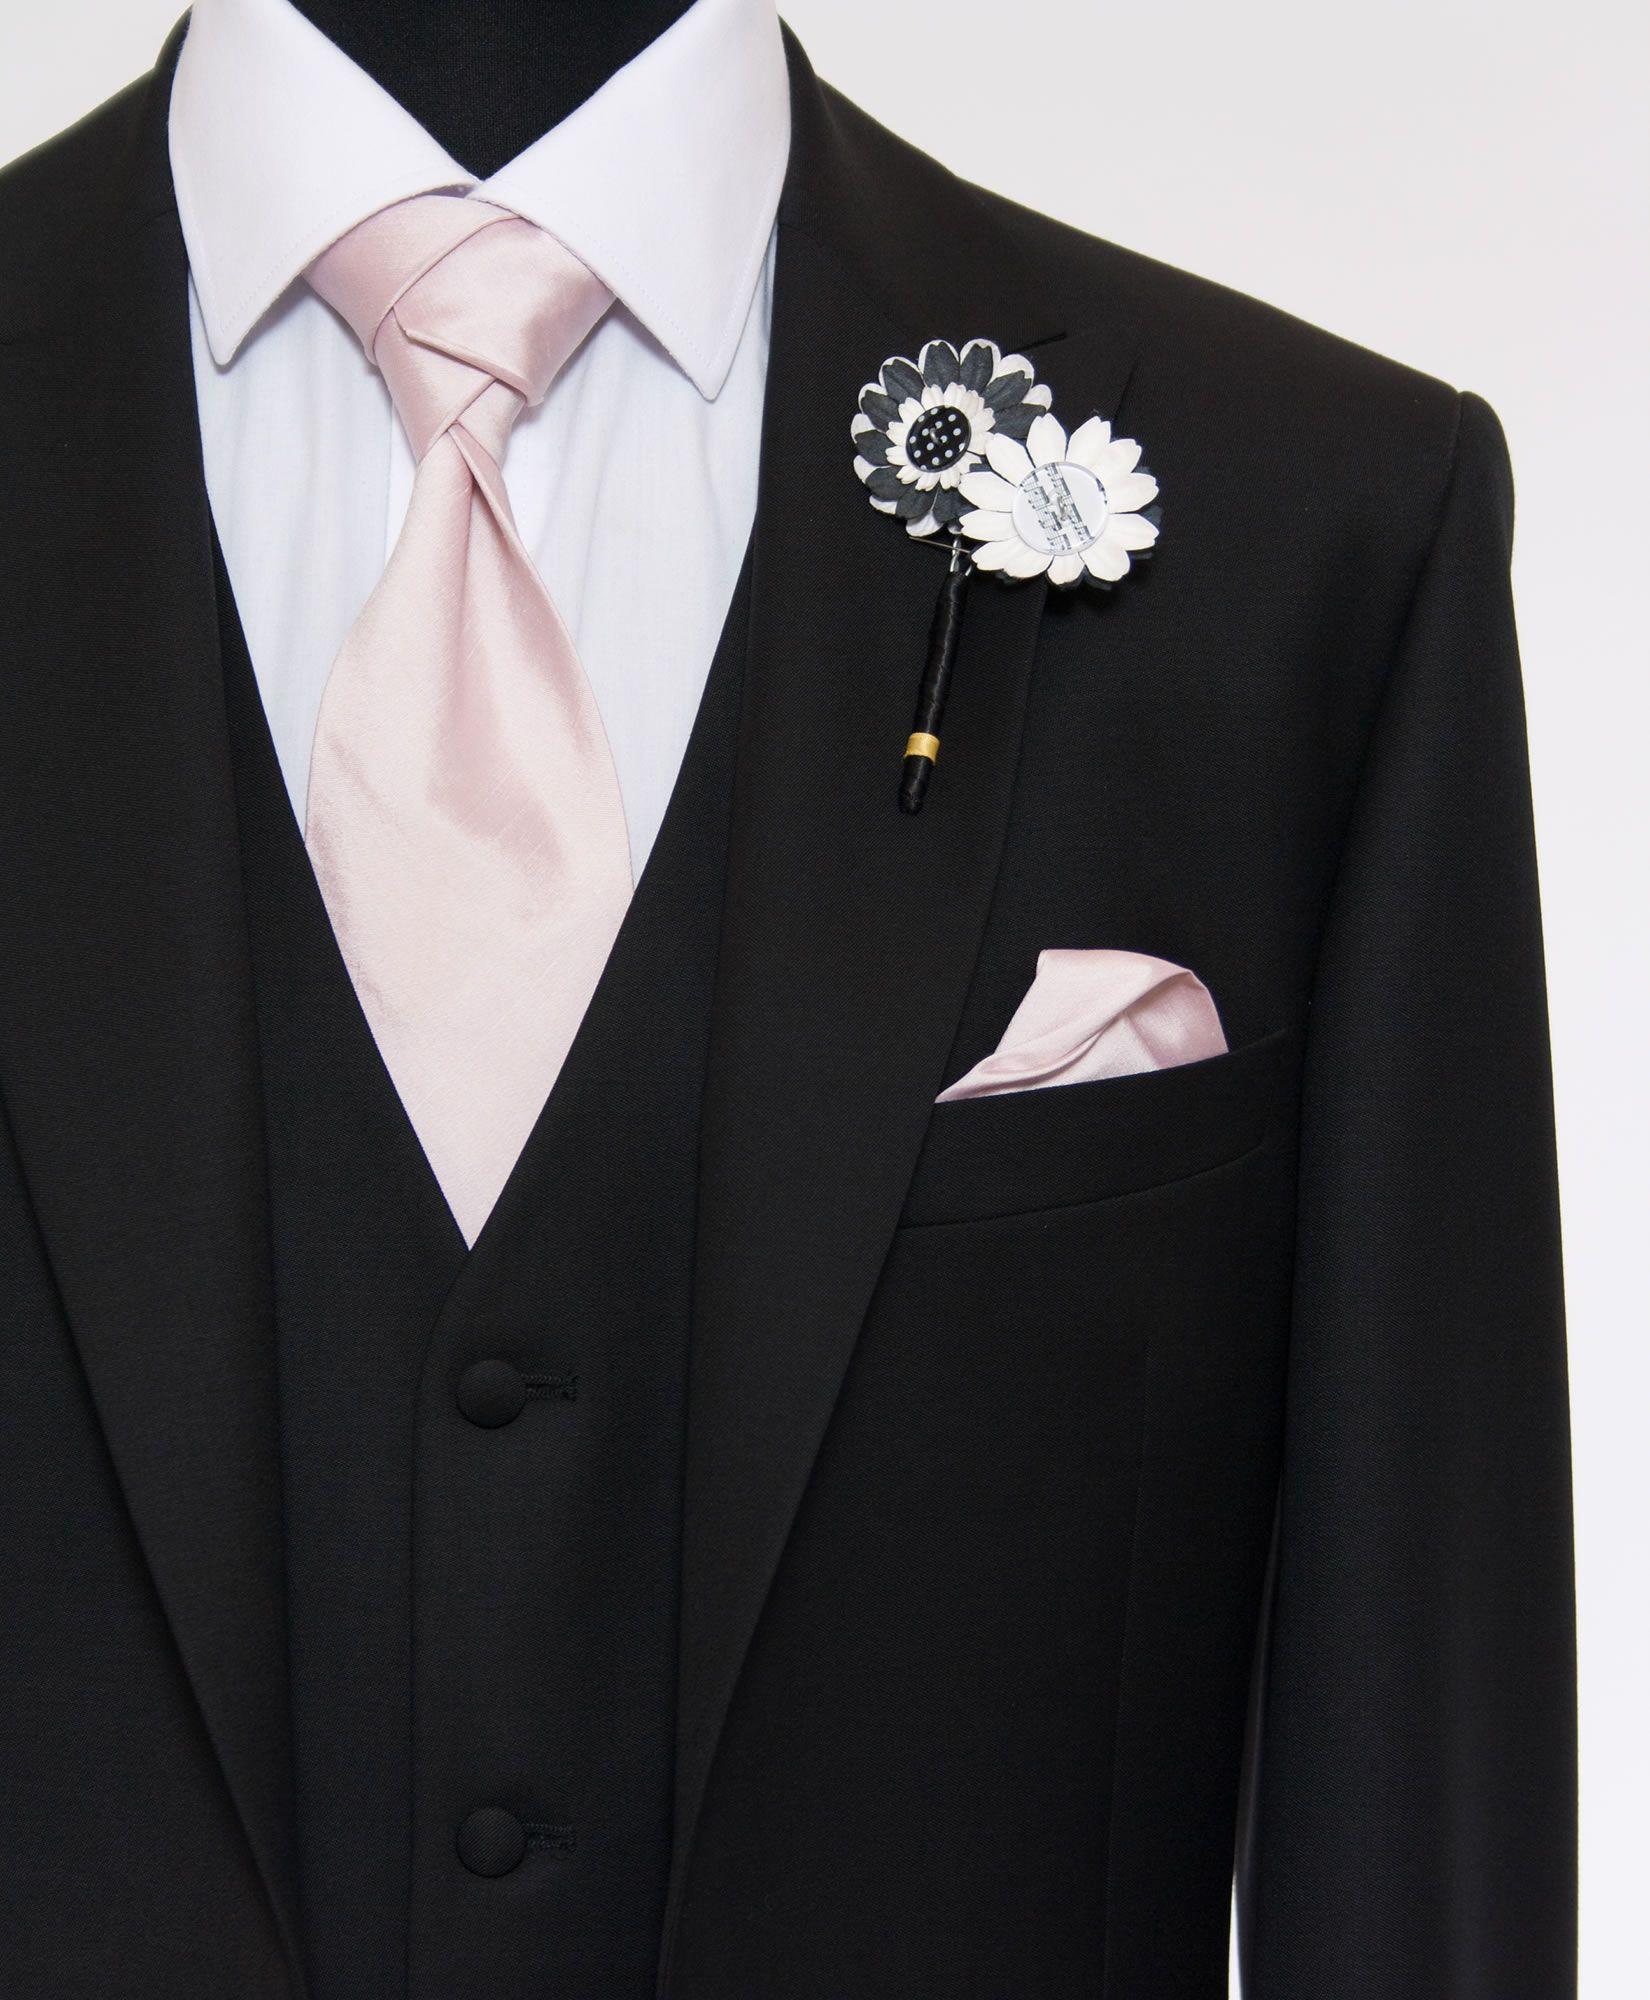 black suit pink tie photo - 1